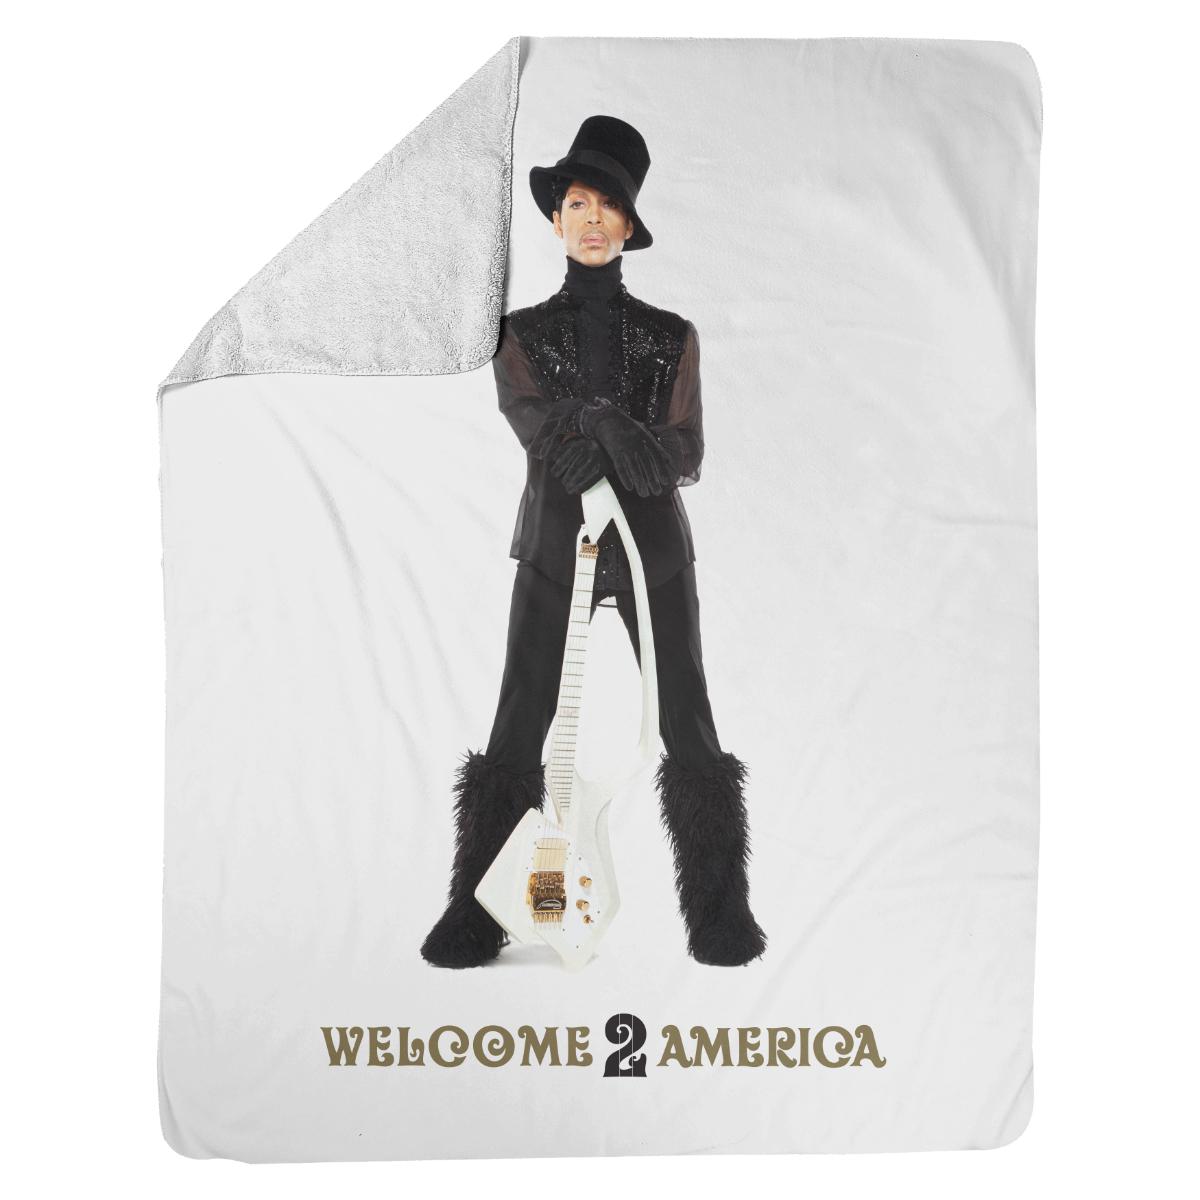 Welcome 2 America Portrait Blanket